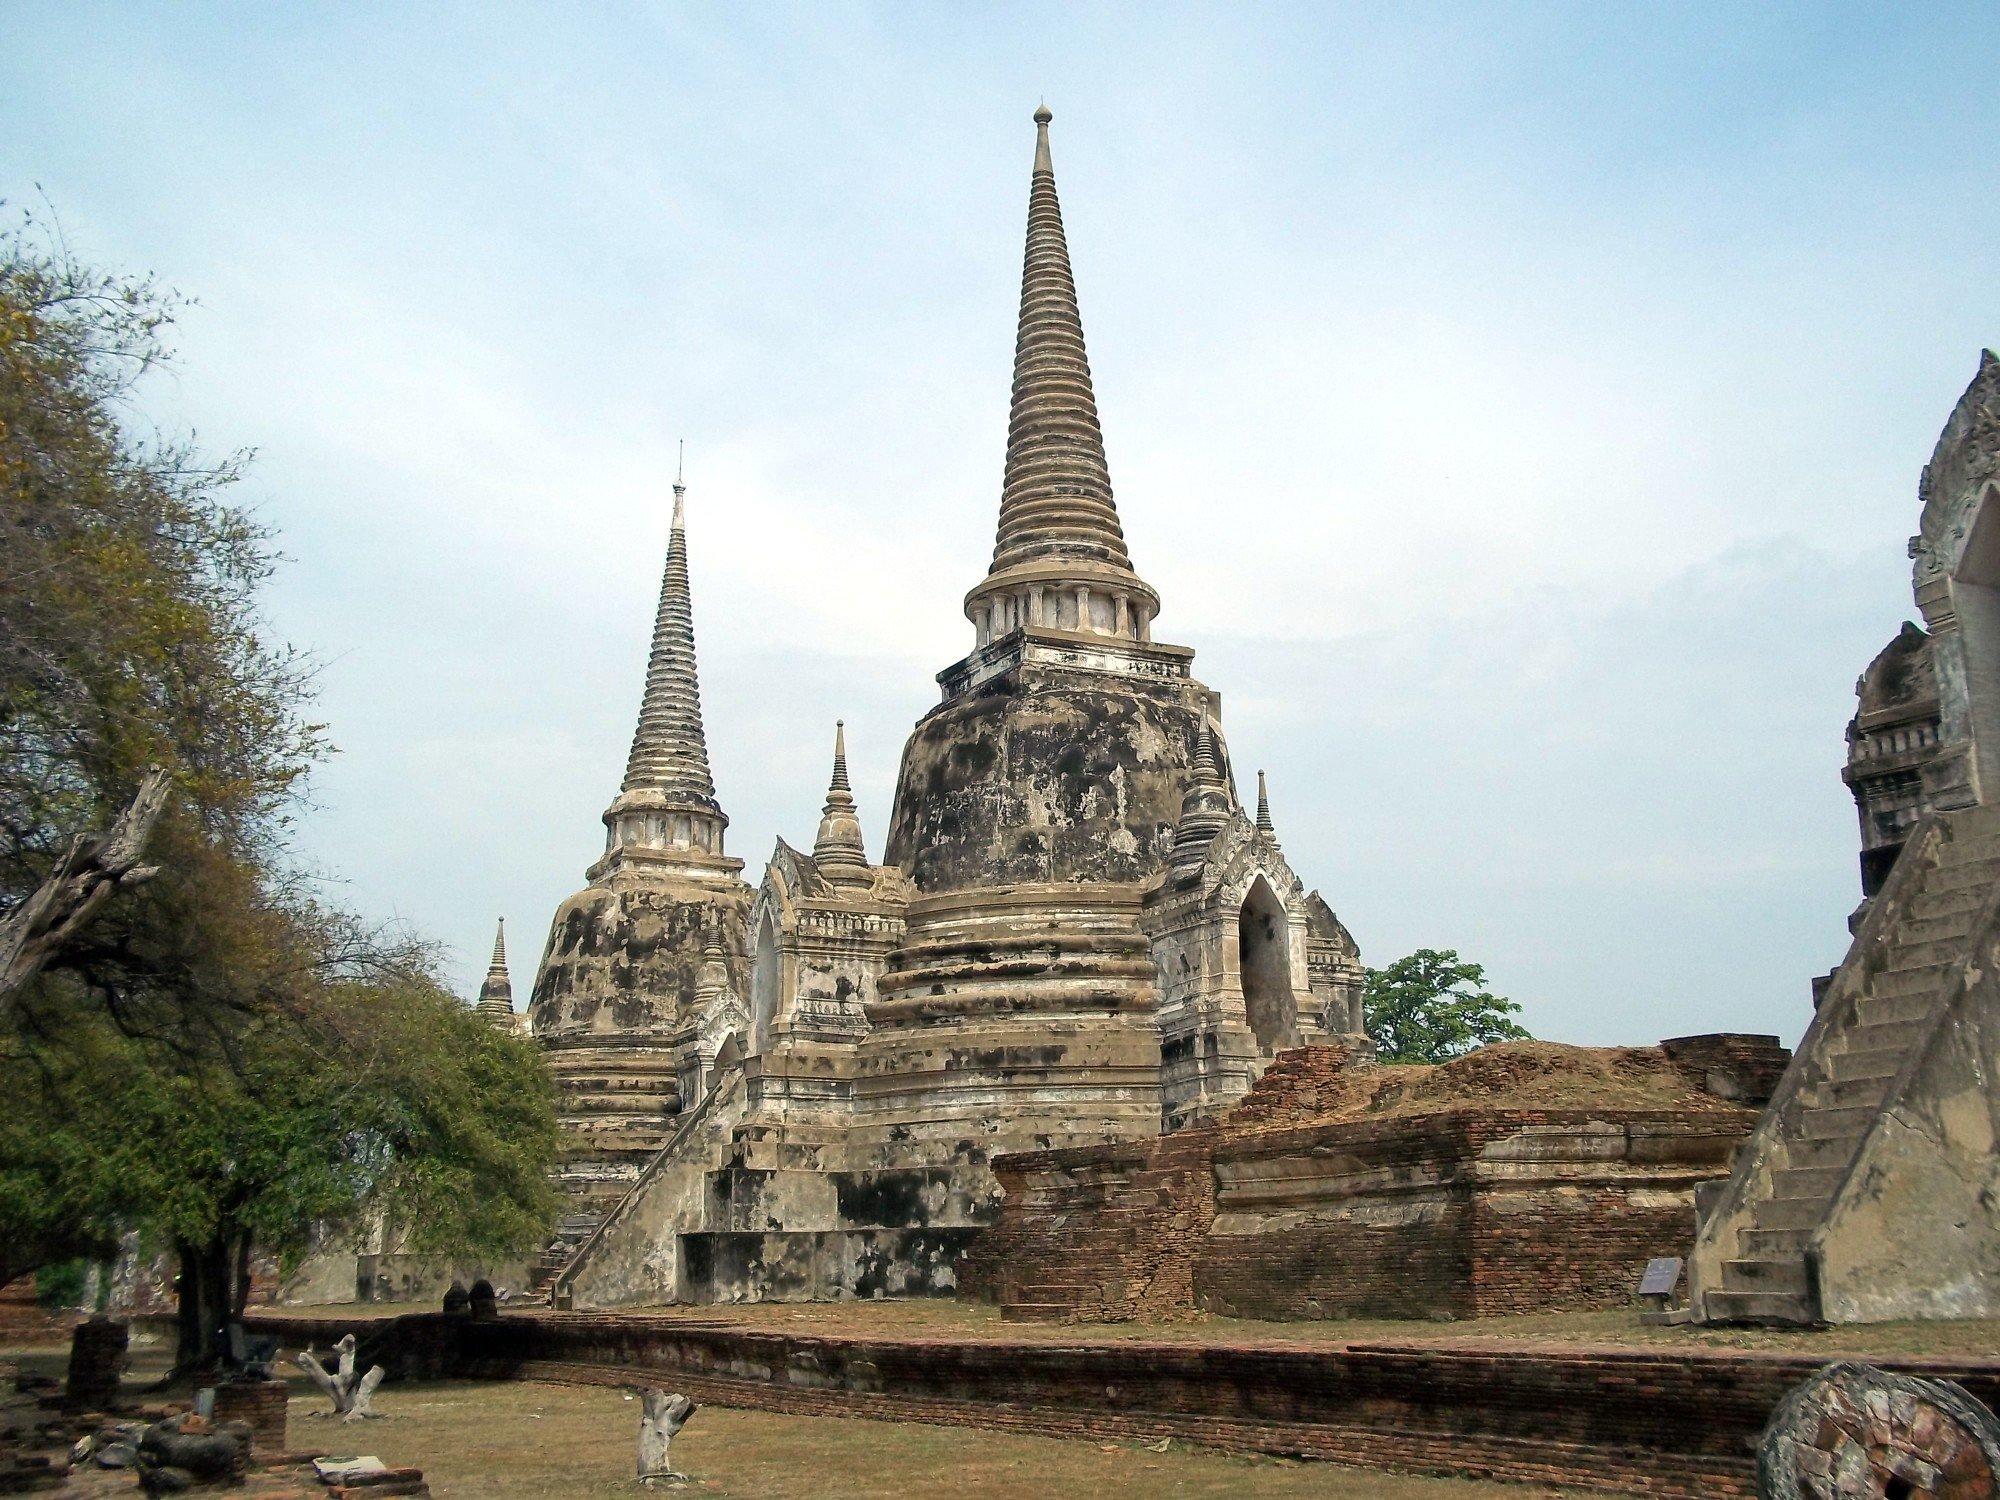 Wat Phra Sri Sanphet in Ayutthaya Historical Park